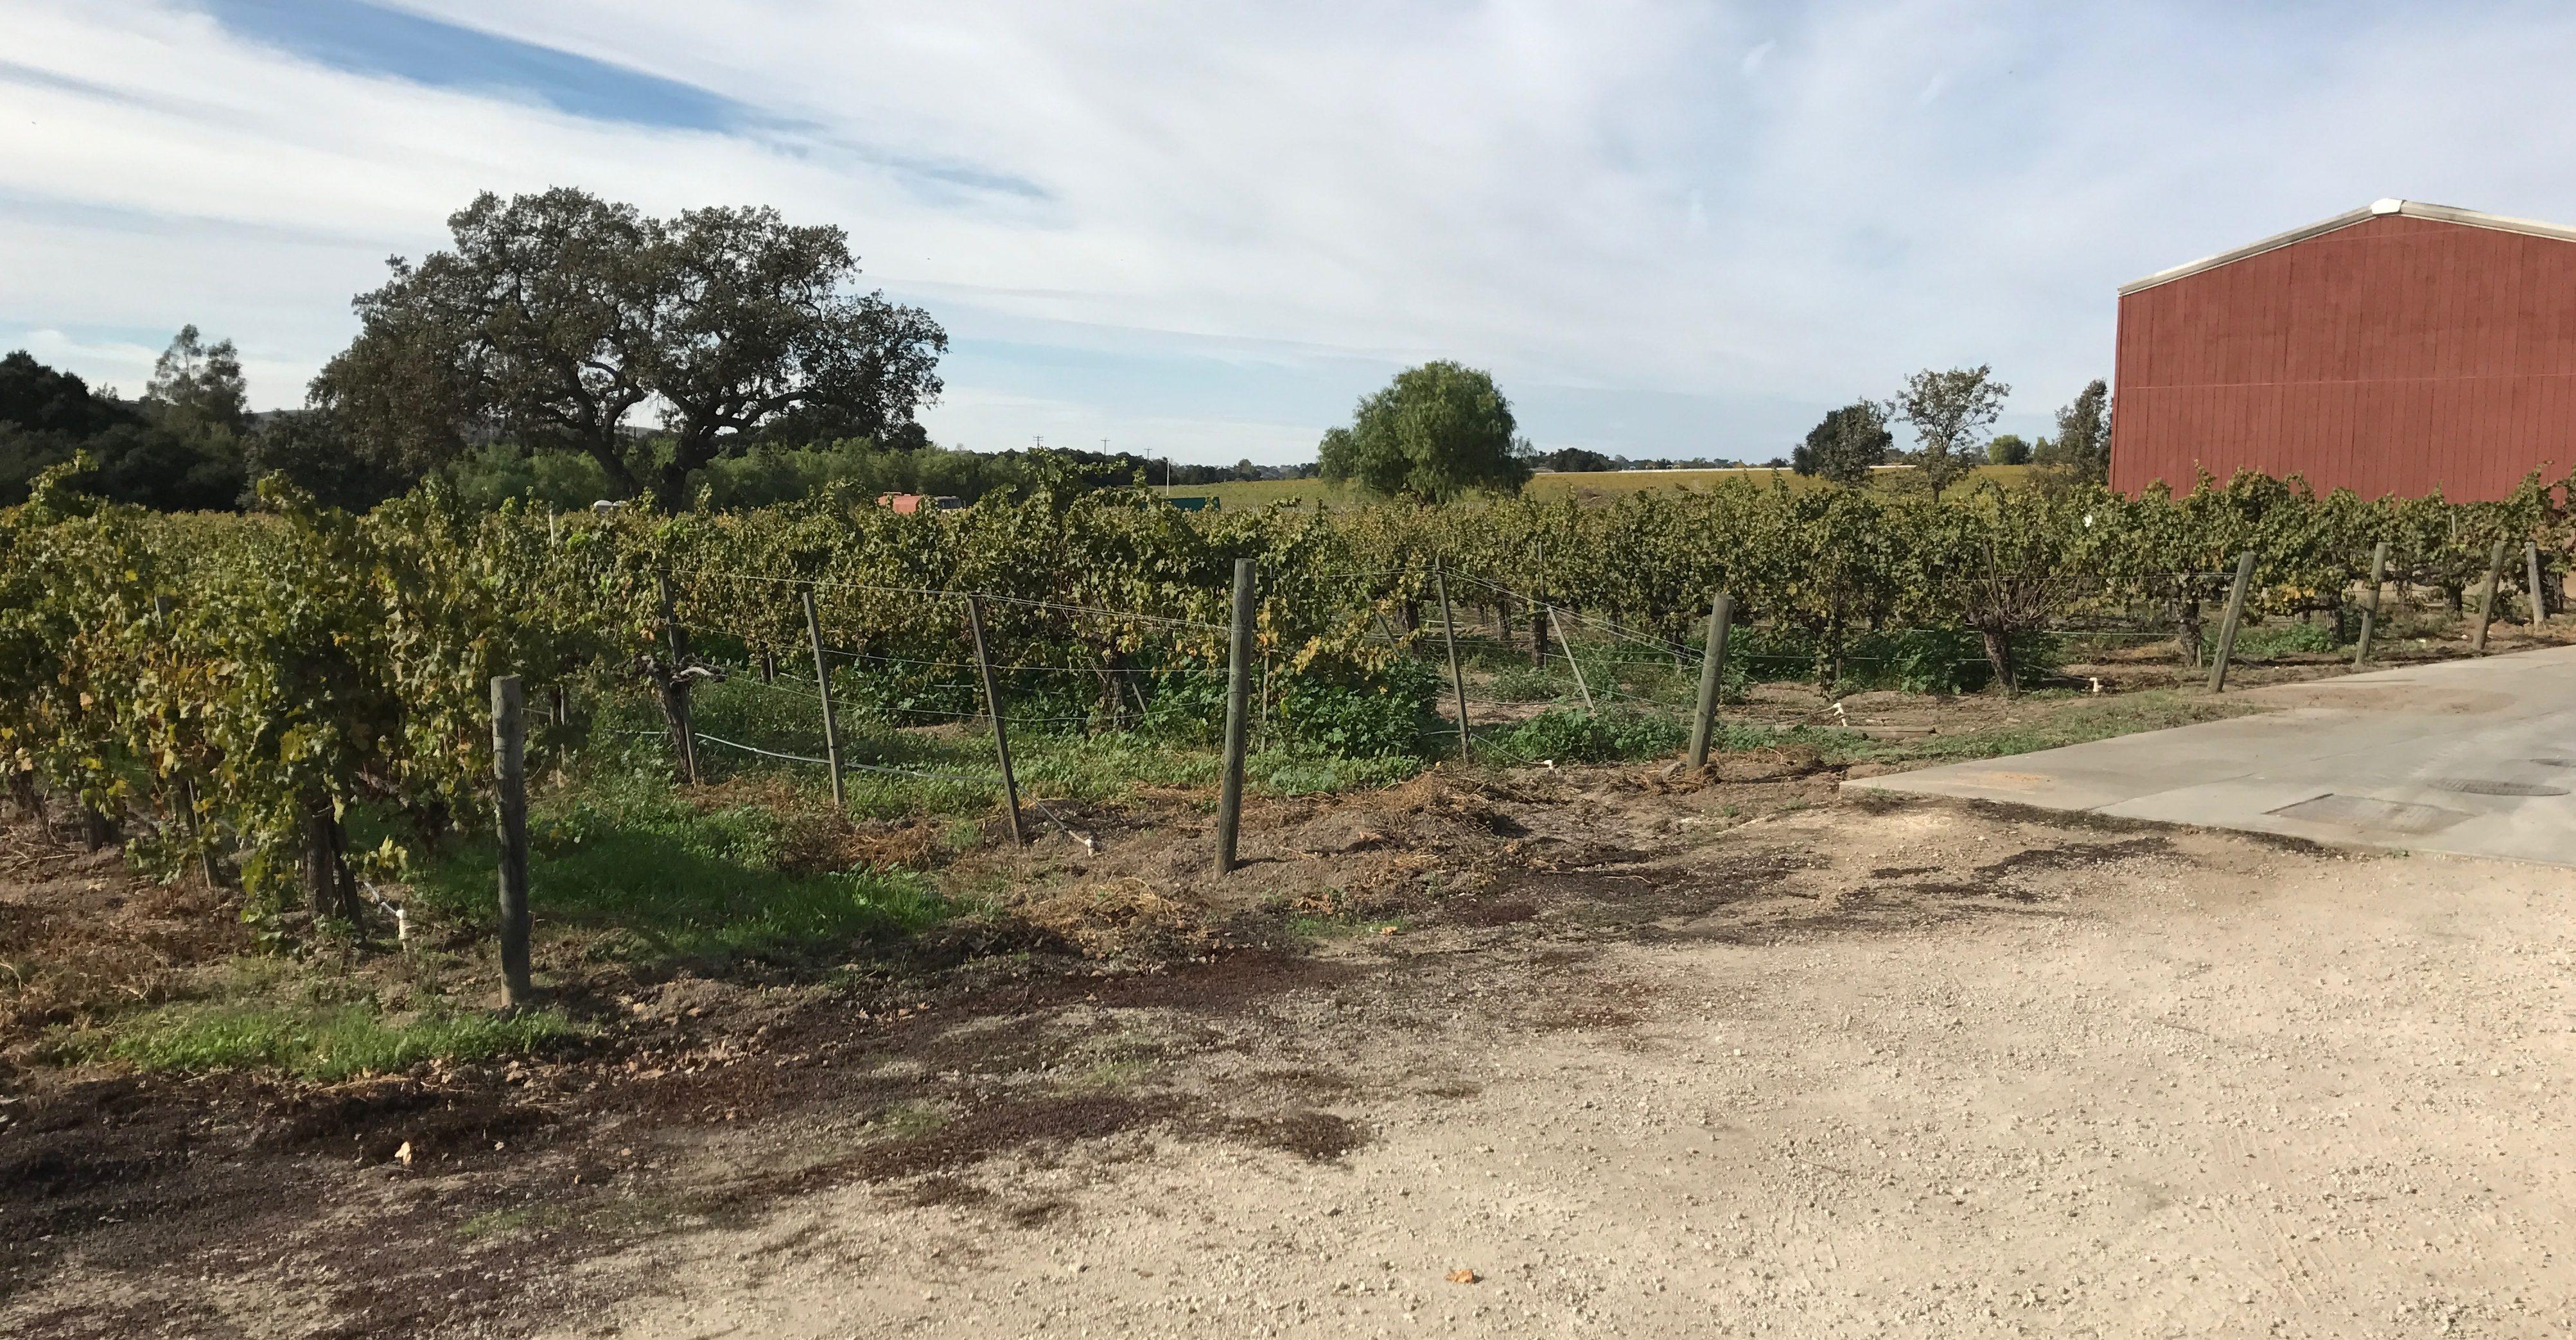 Bordeaux meets California at Brander Vineyard